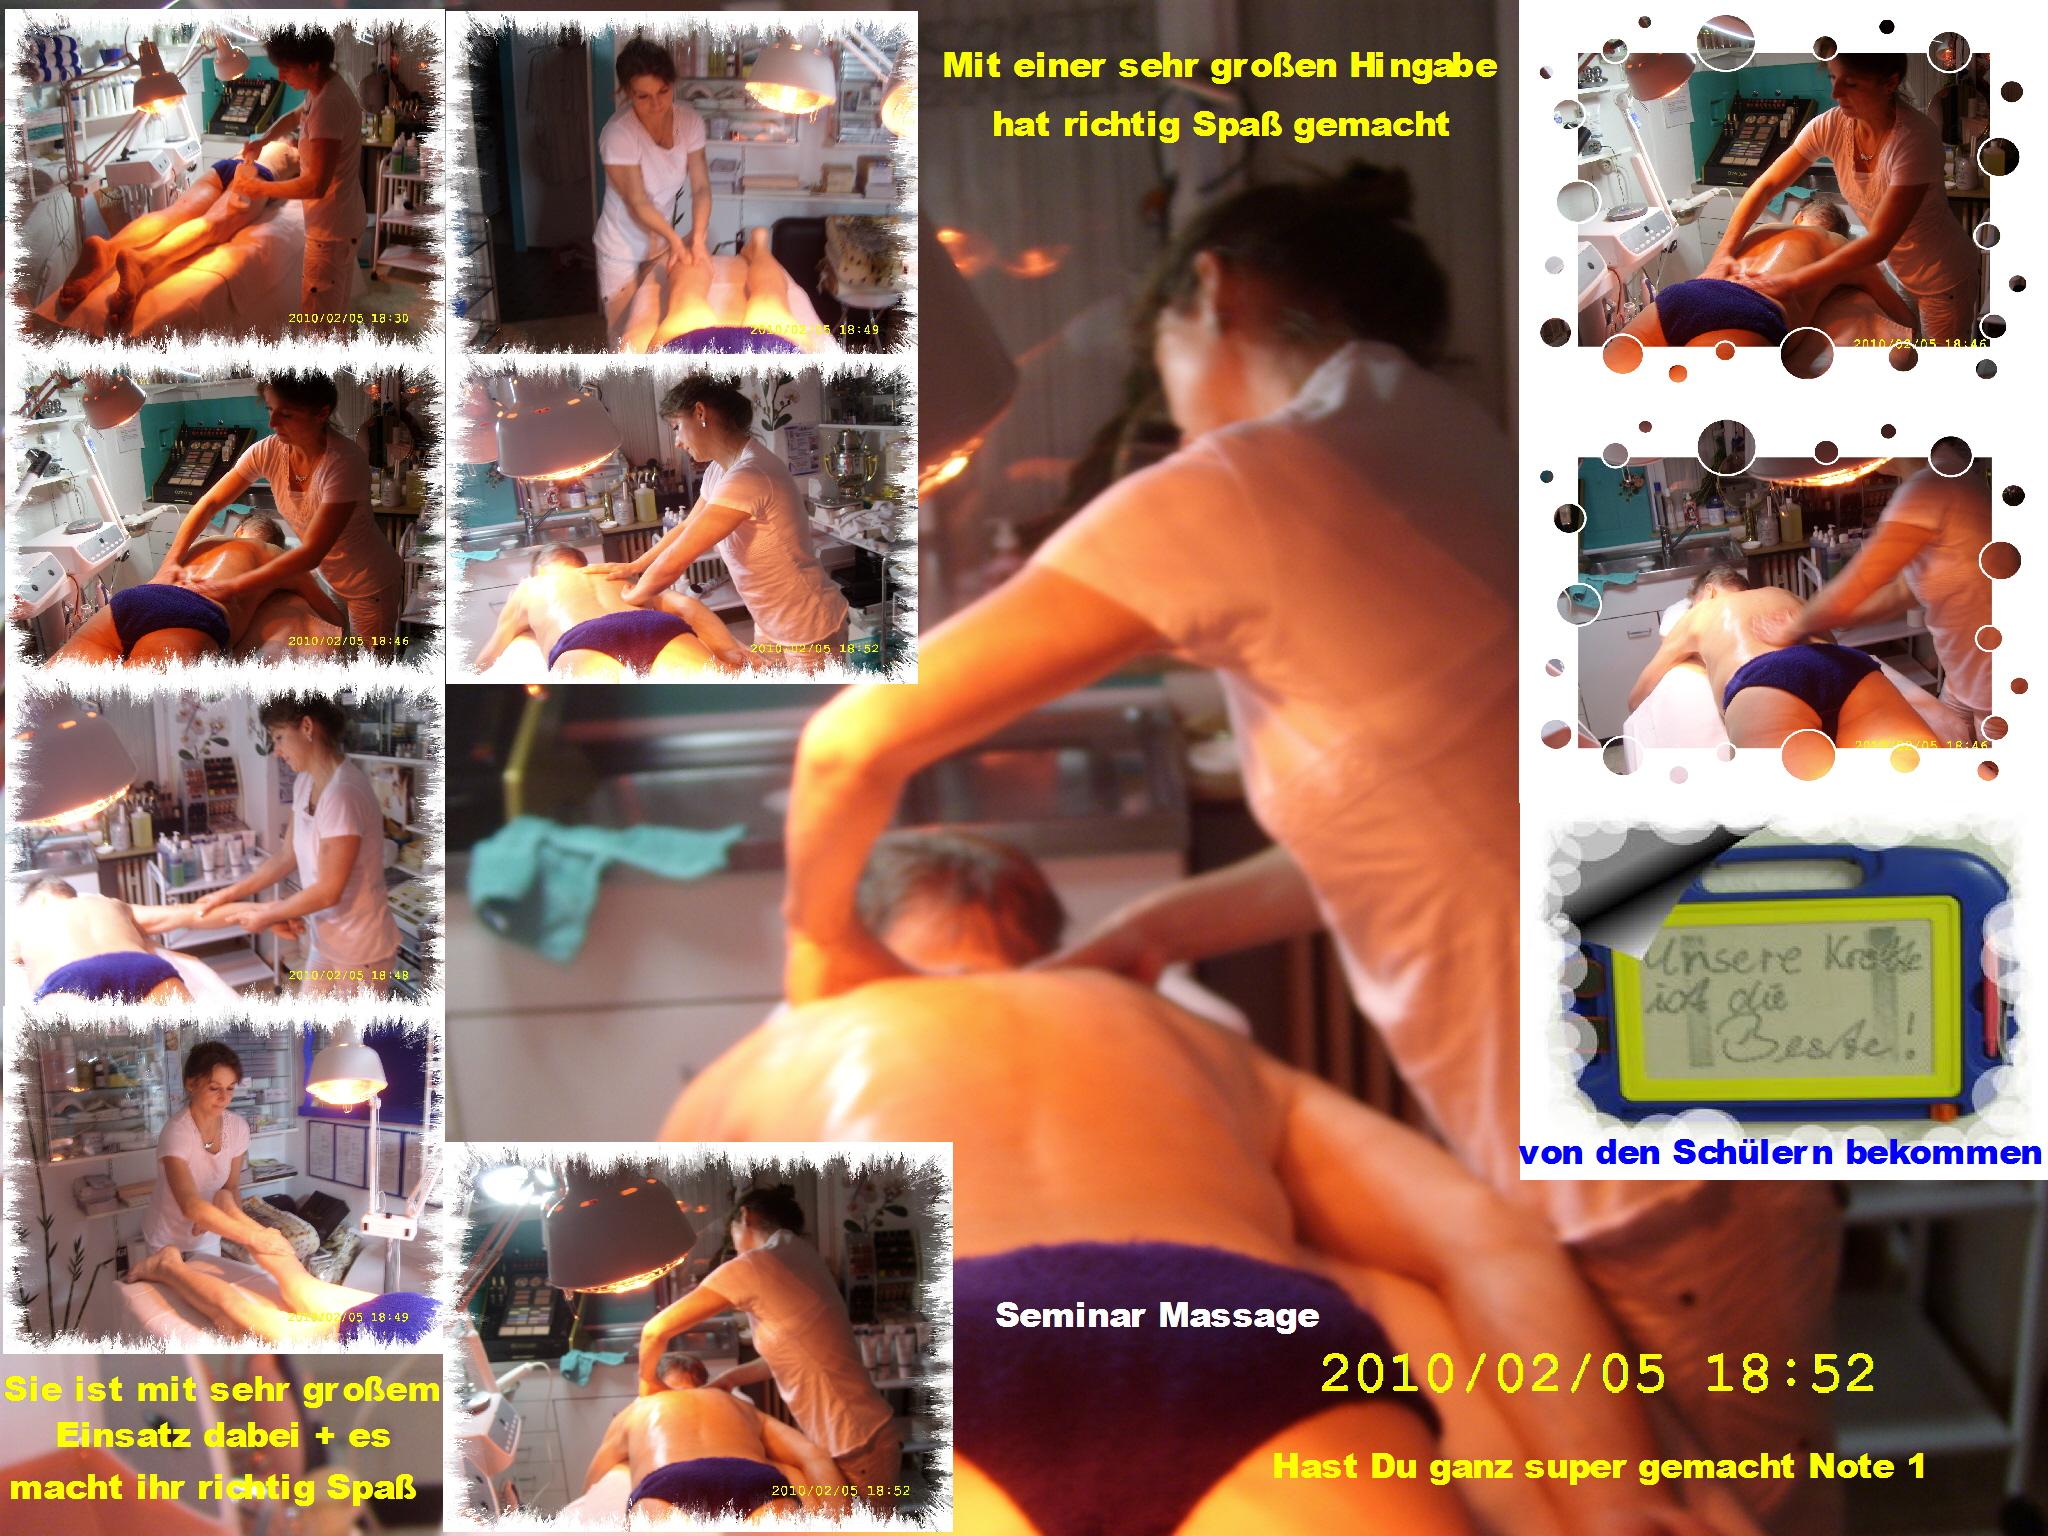 Seminar Massage Bilder Kosmetik      (14)